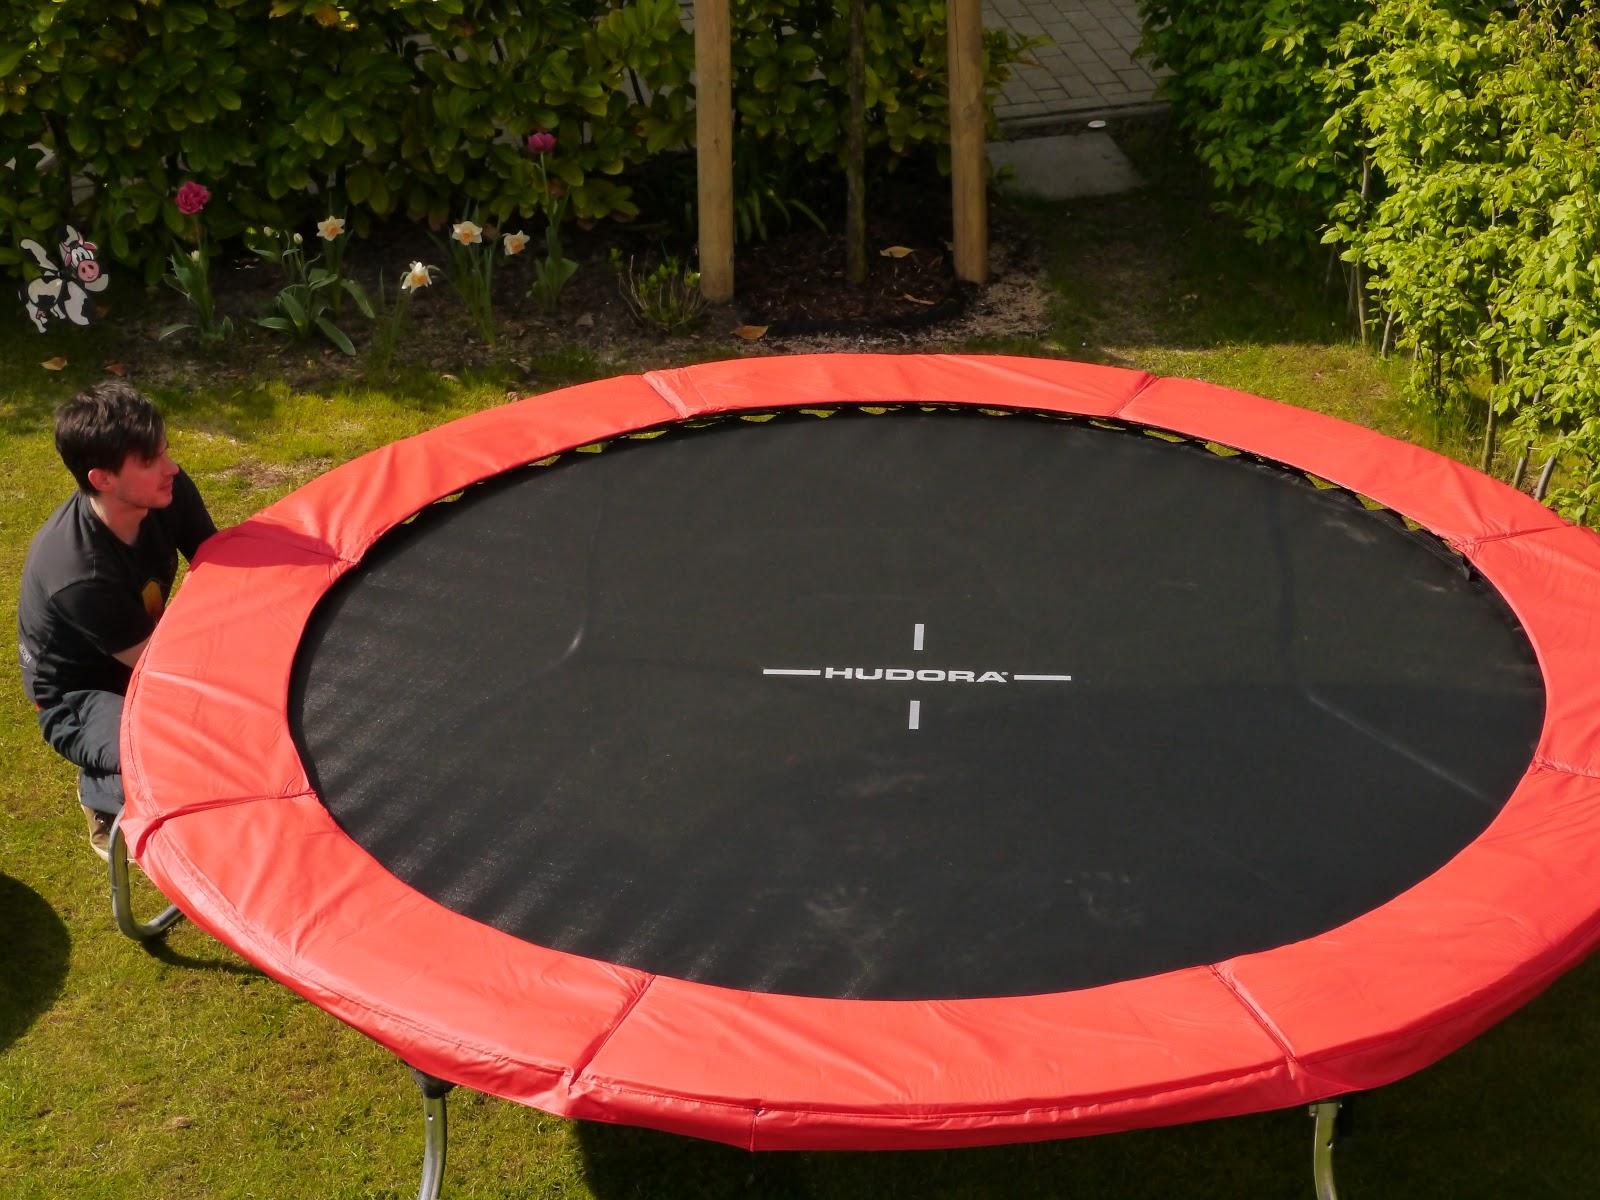 Klettergerüst Hudora : Im test das hudora fantastic v trampolin lari lara eine